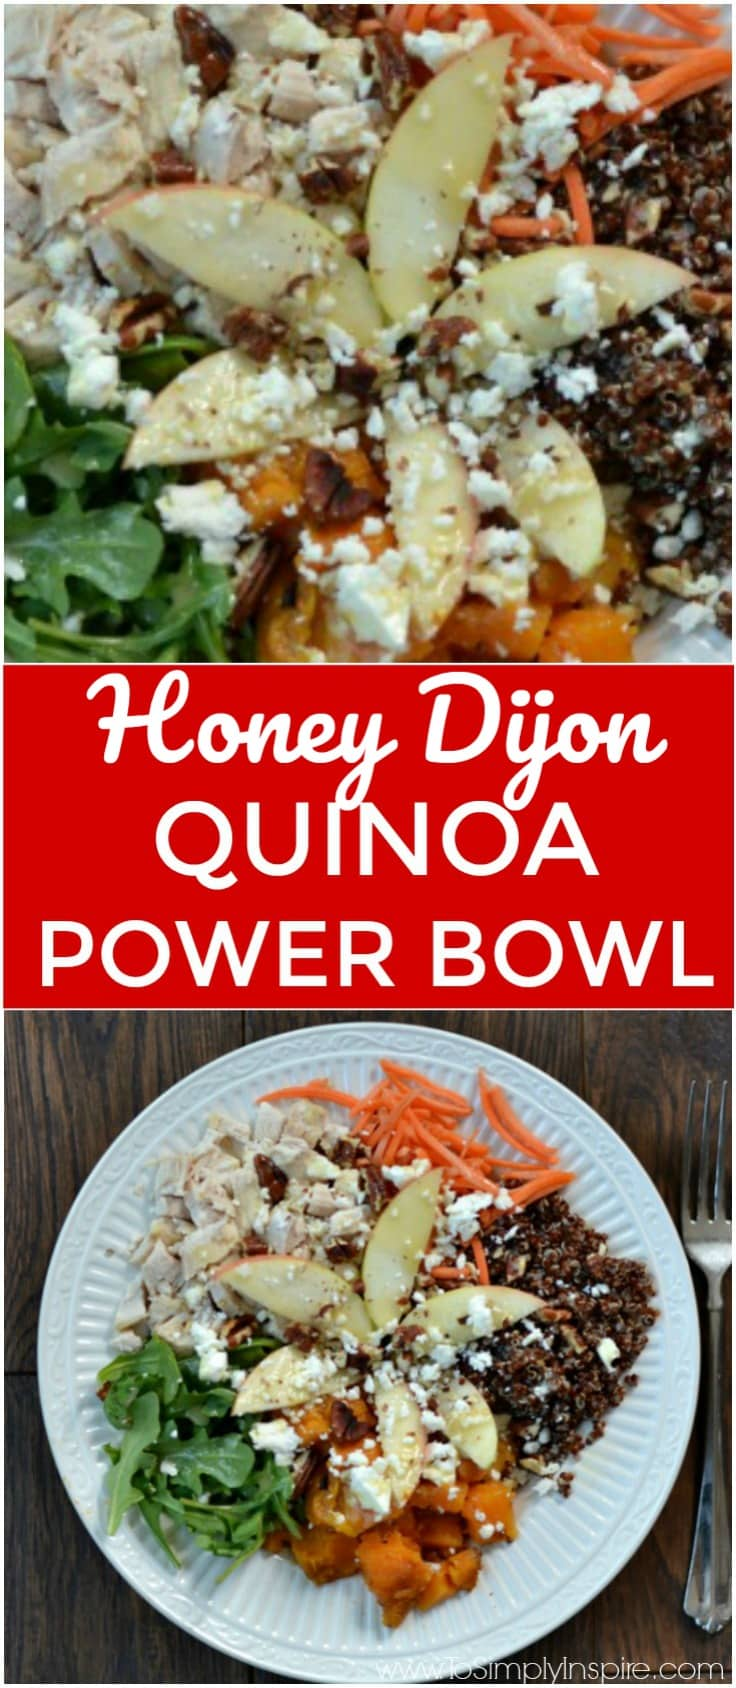 Quinoa Power Bowl - Sweet potatoes, tasty arugula, diced apple, red quinoa, feta, roasted pecans topped with honey dijon vinaigrette.